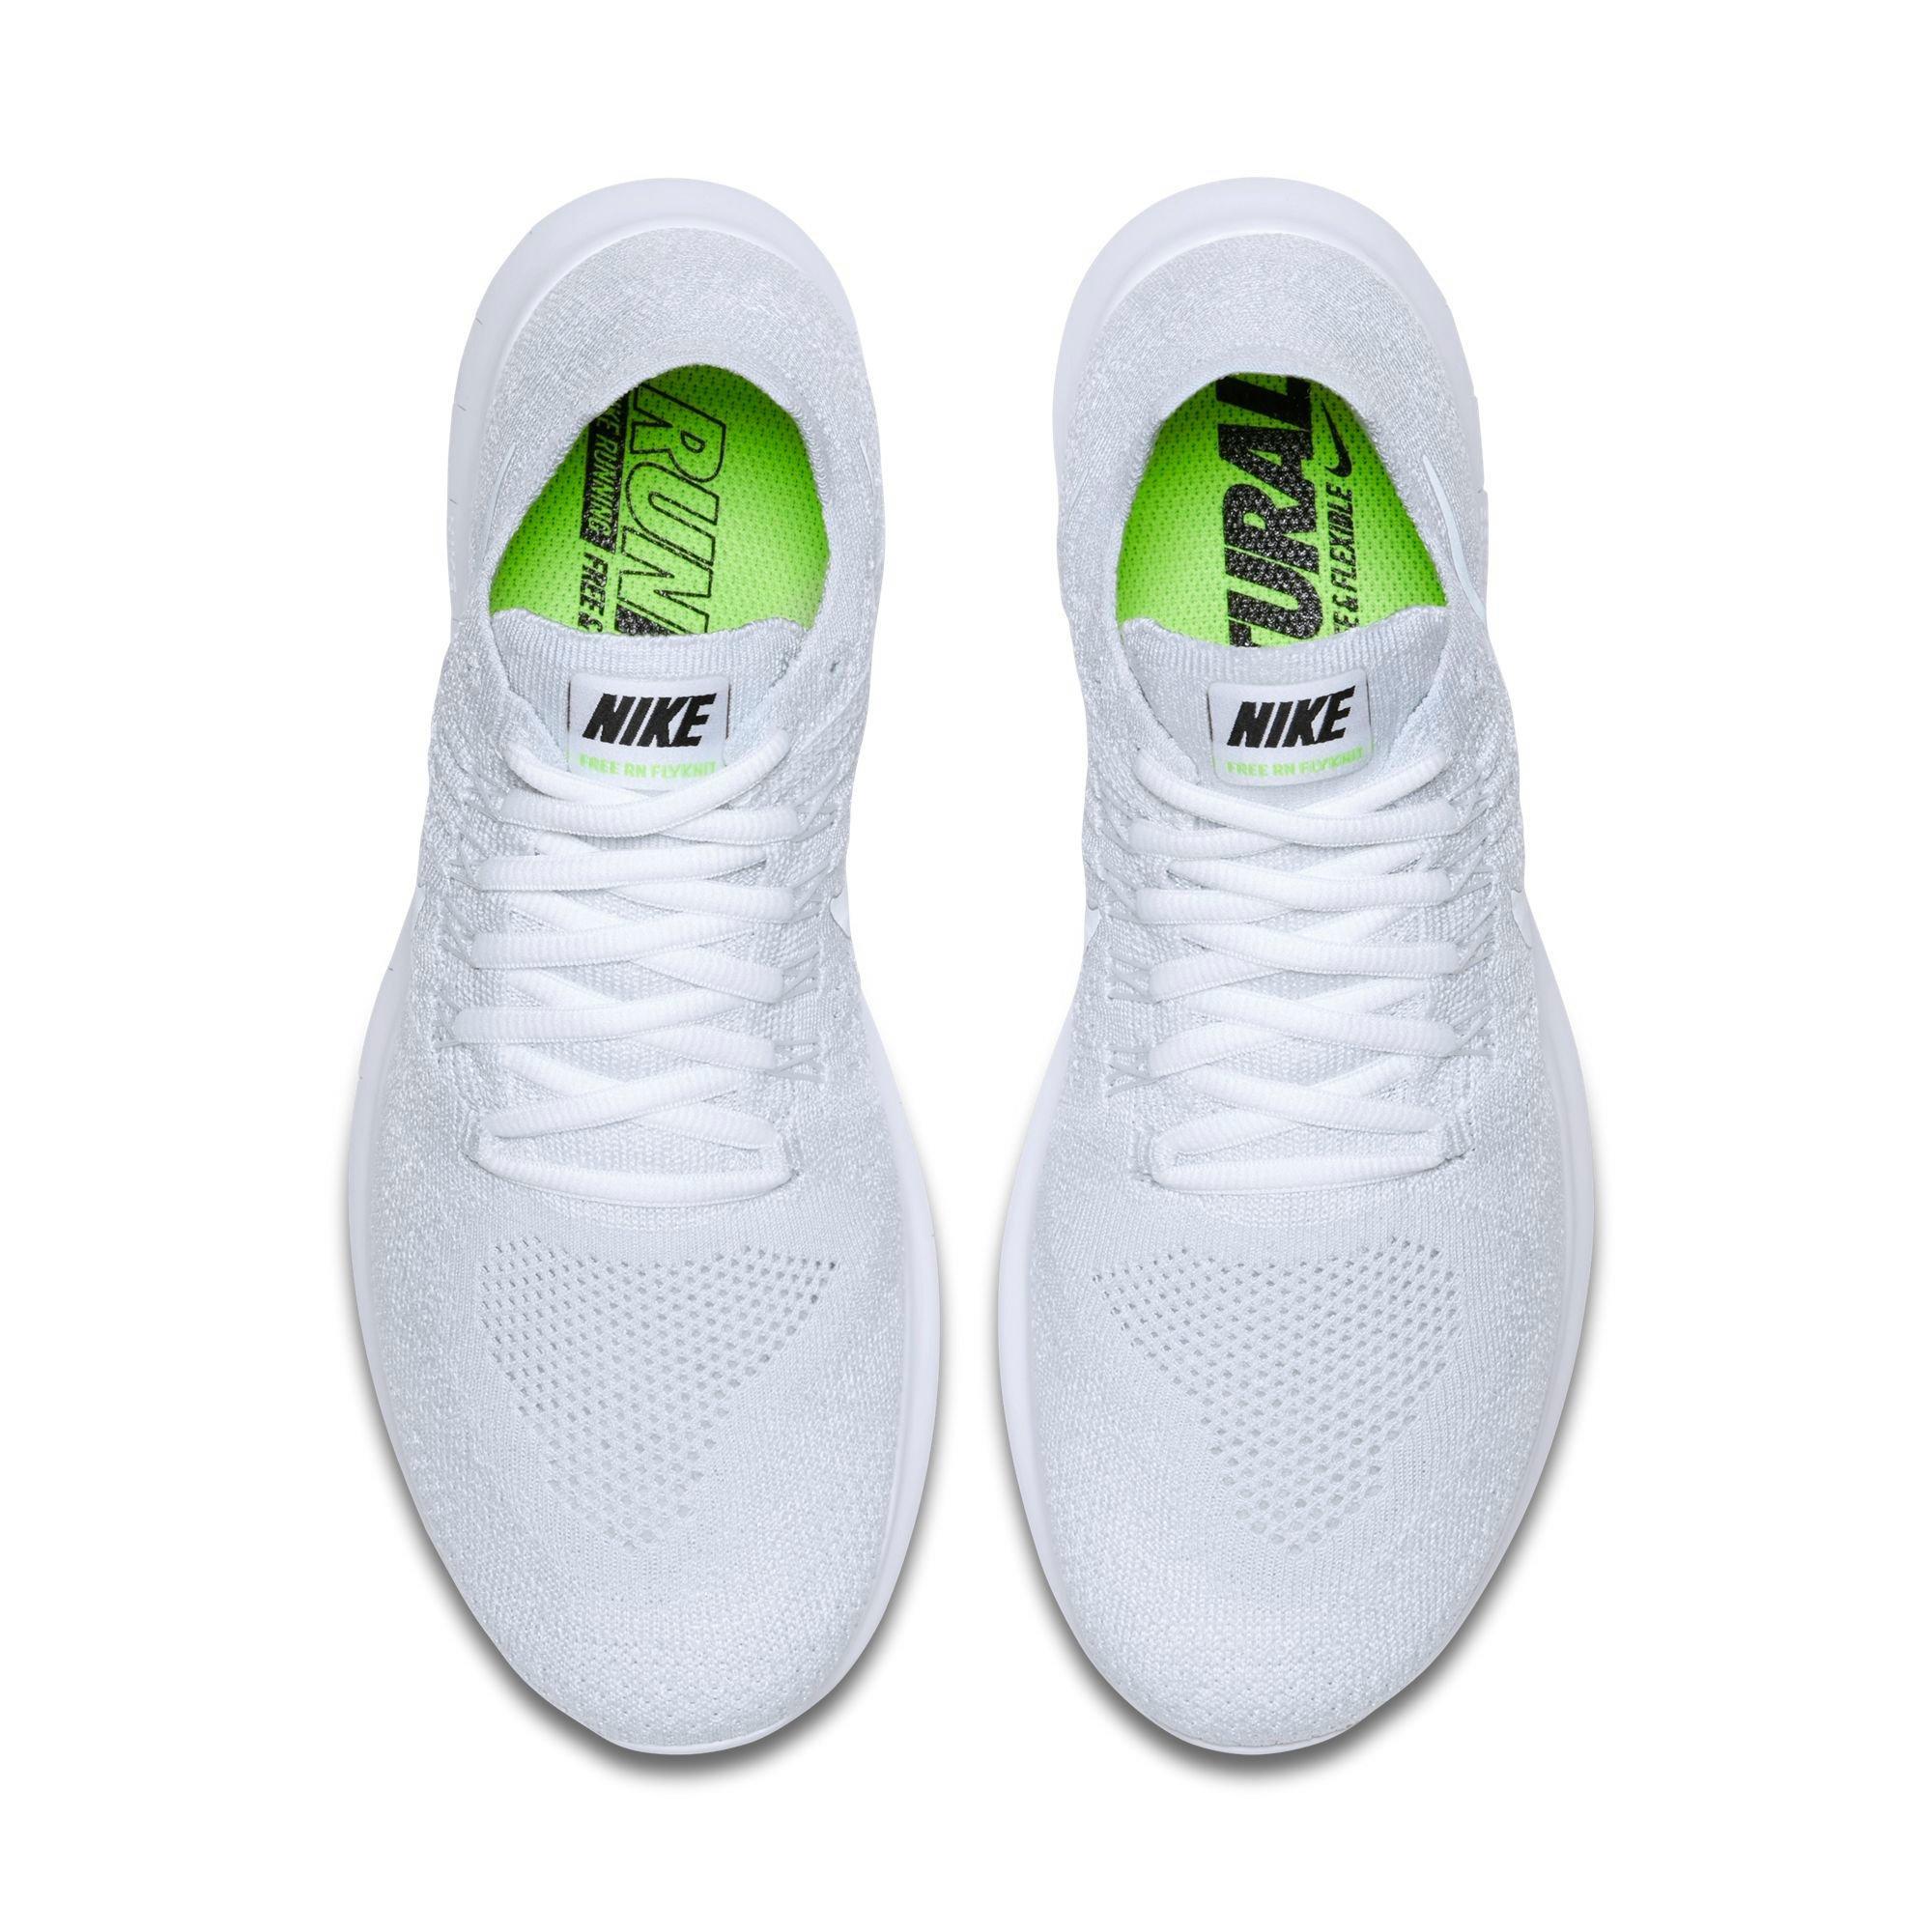 white nike free run shoes